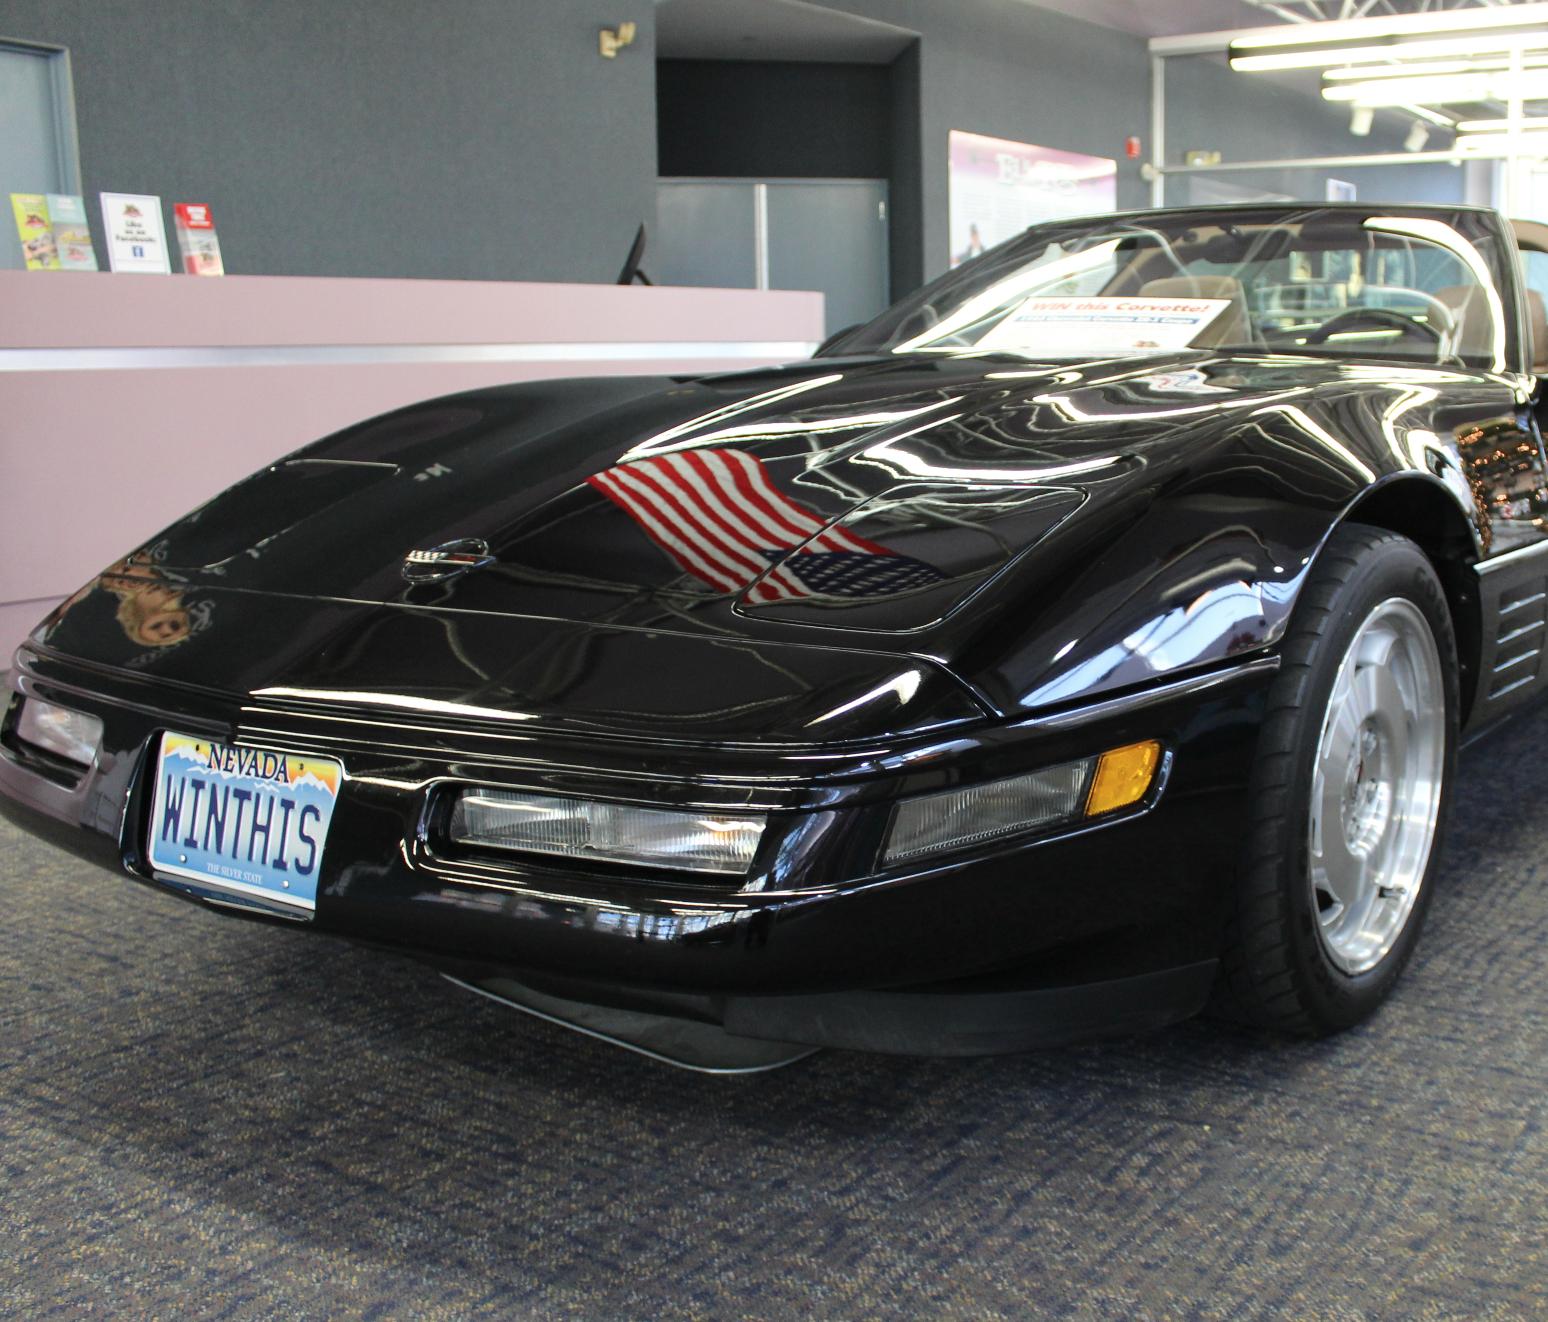 National Automobile Museum Raffles Off Corvette for 2018 ...